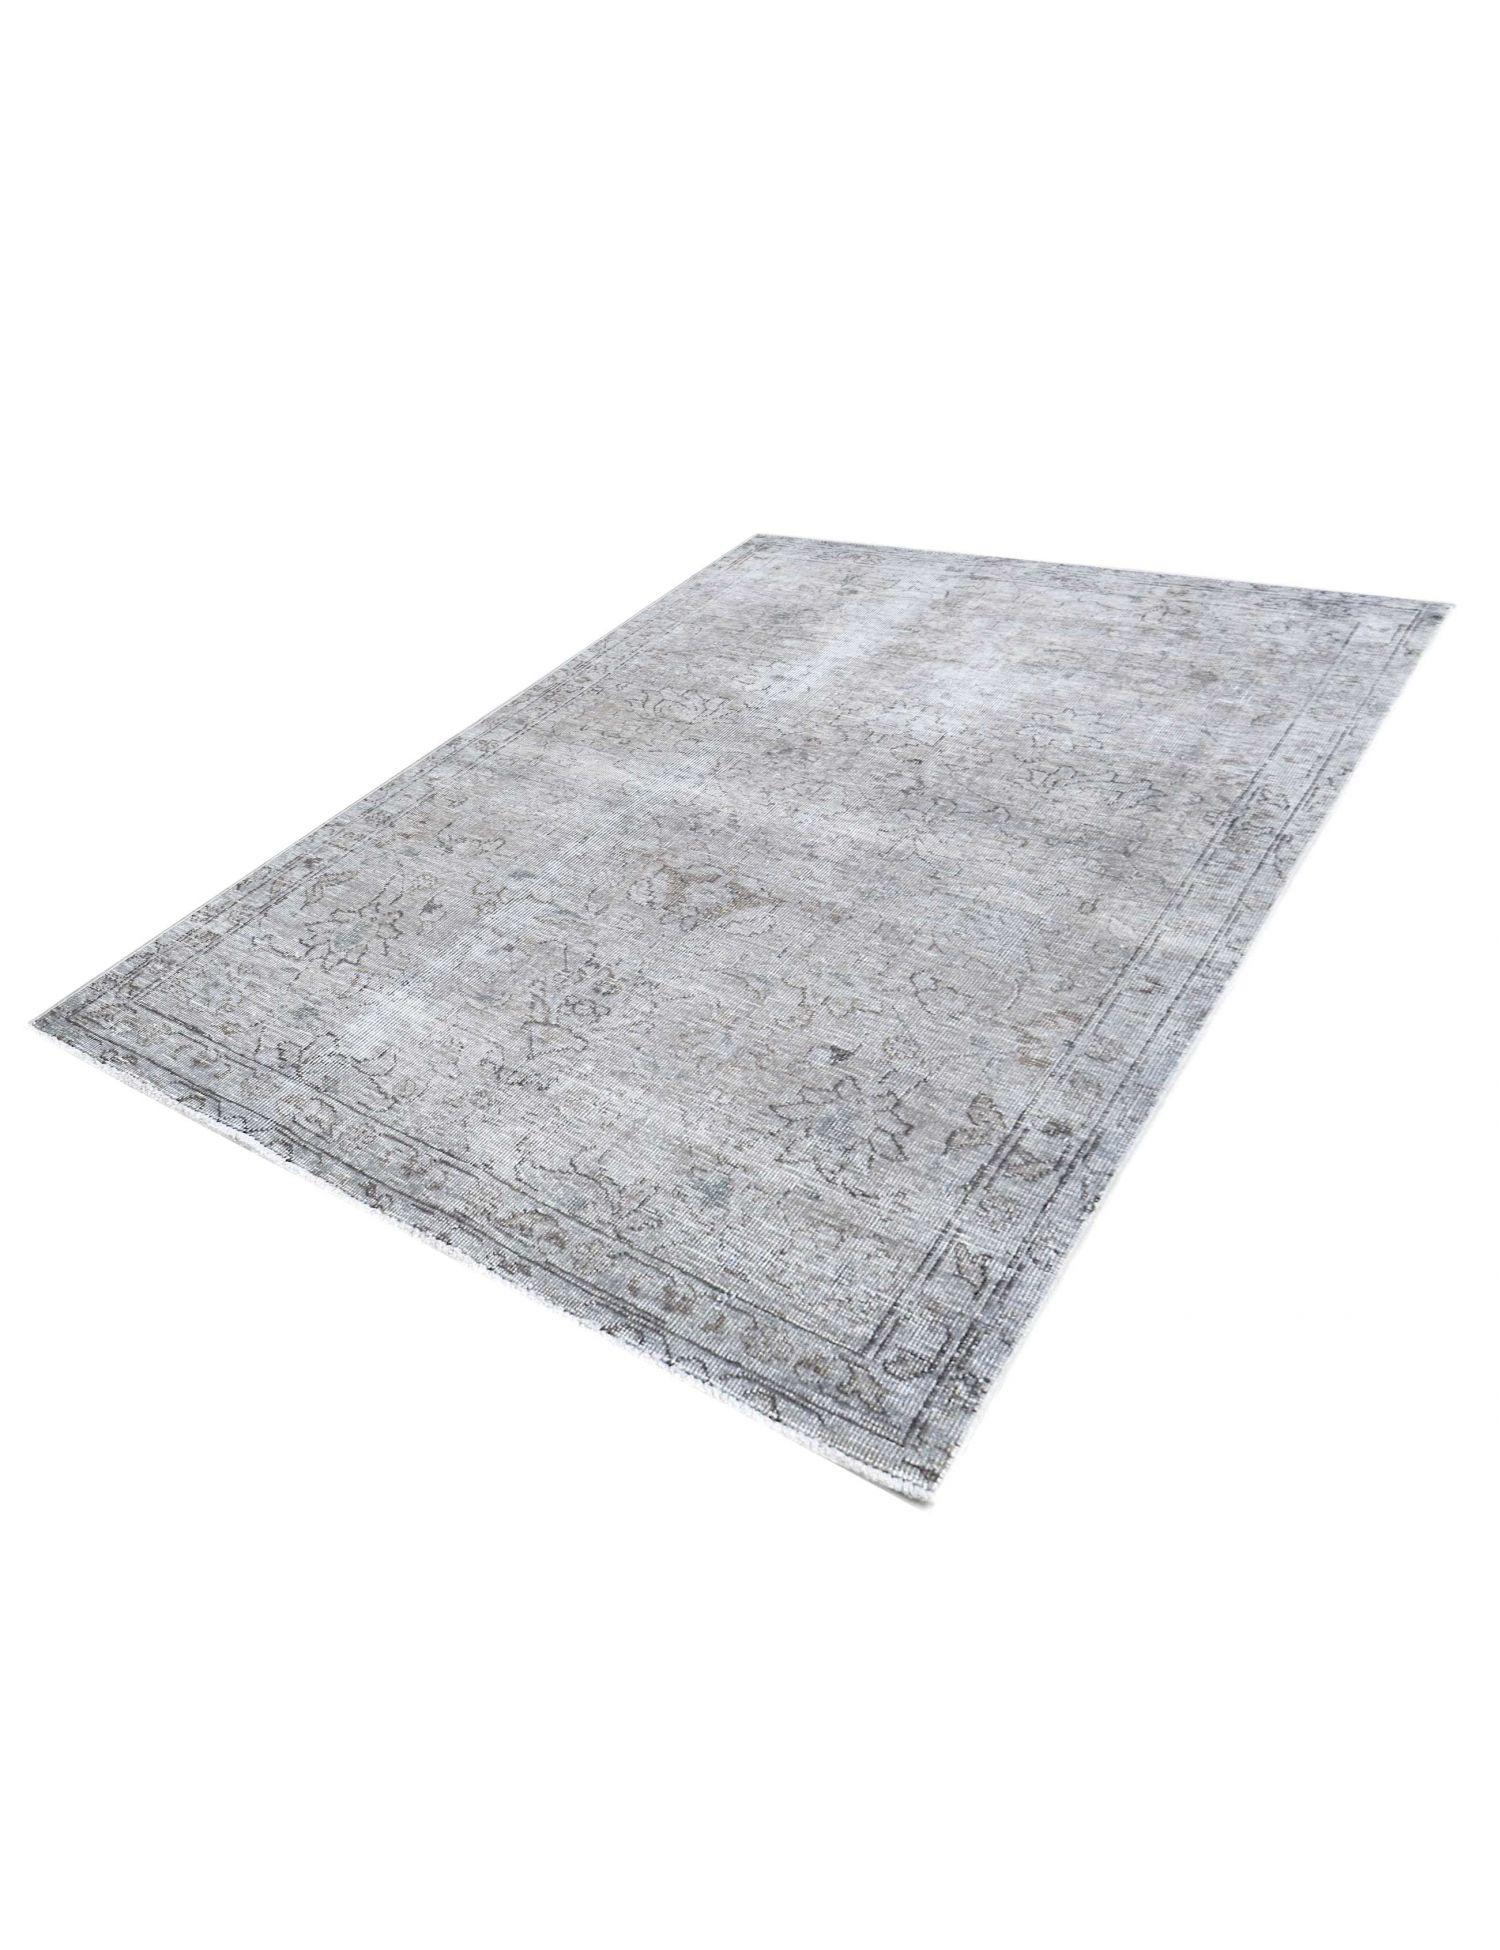 Vintage Perserteppich  grau <br/>166 x 111 cm